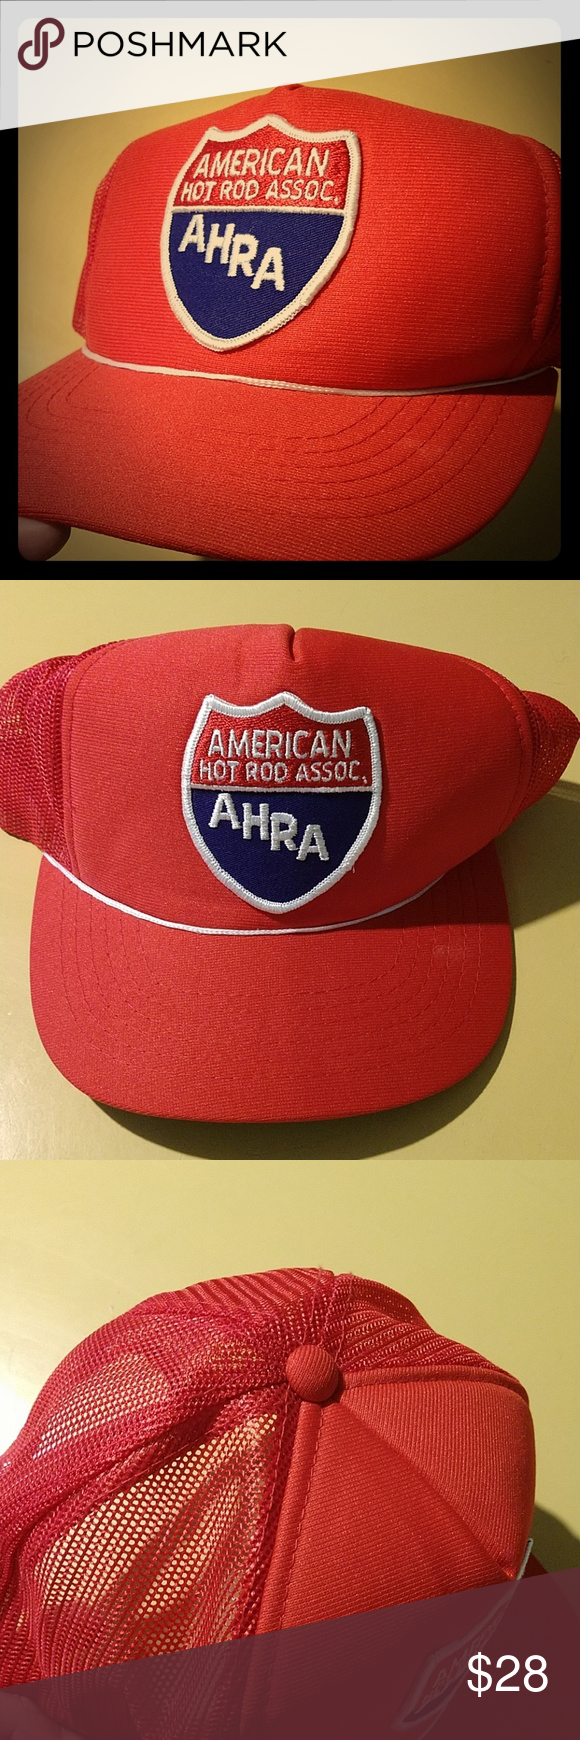 Vtg HOT ROD AHRA Mesh Snap Back Trucker Hat Retro vintage American Hot Rod Assoc…